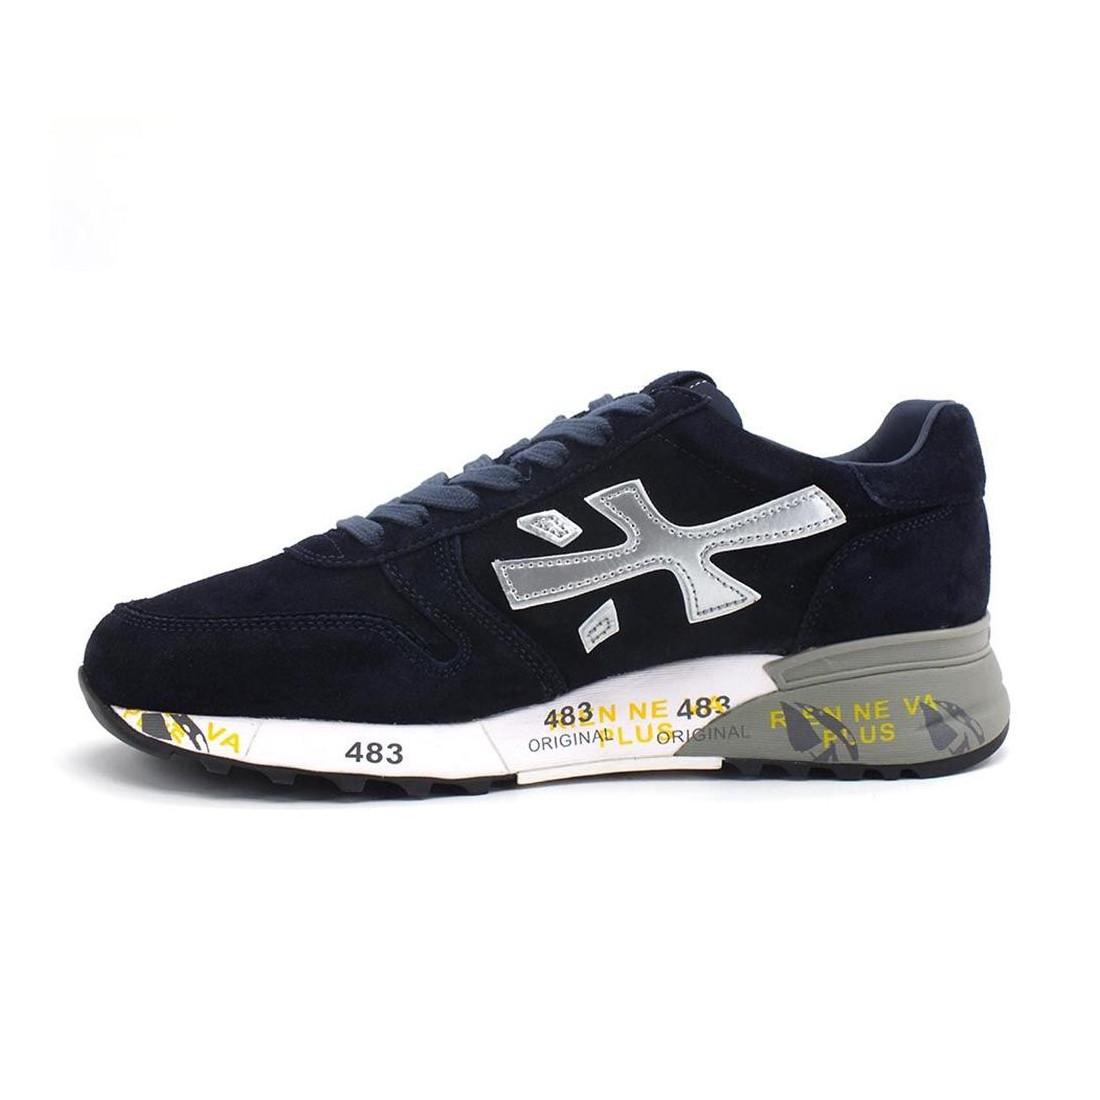 sneakers uomo premiata mick4016 9037